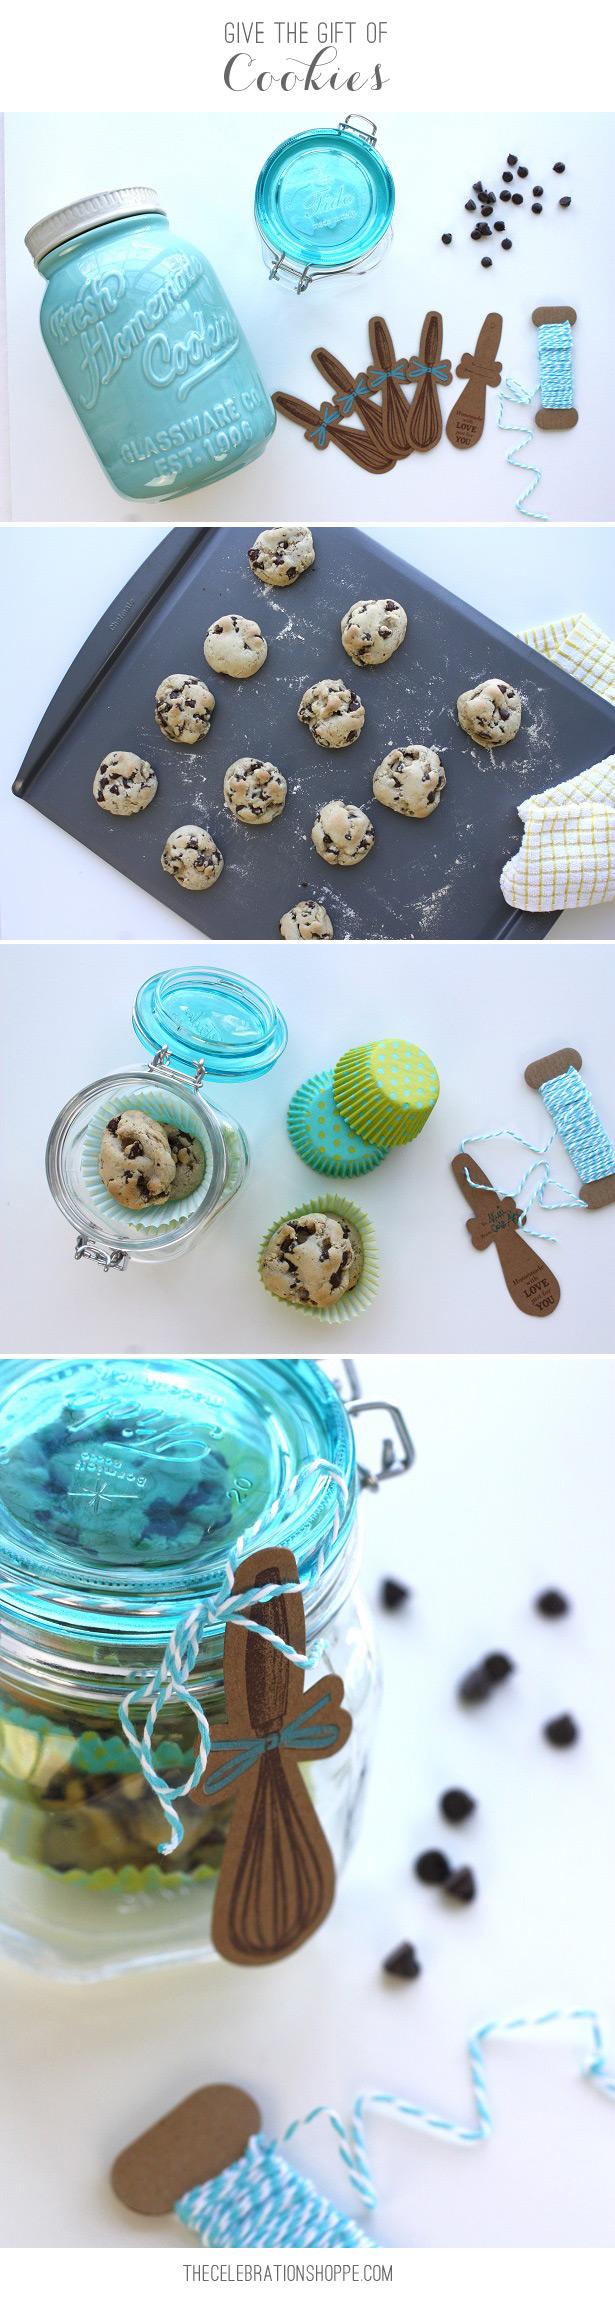 Cookie Jar Gift Idea | Kim Byers